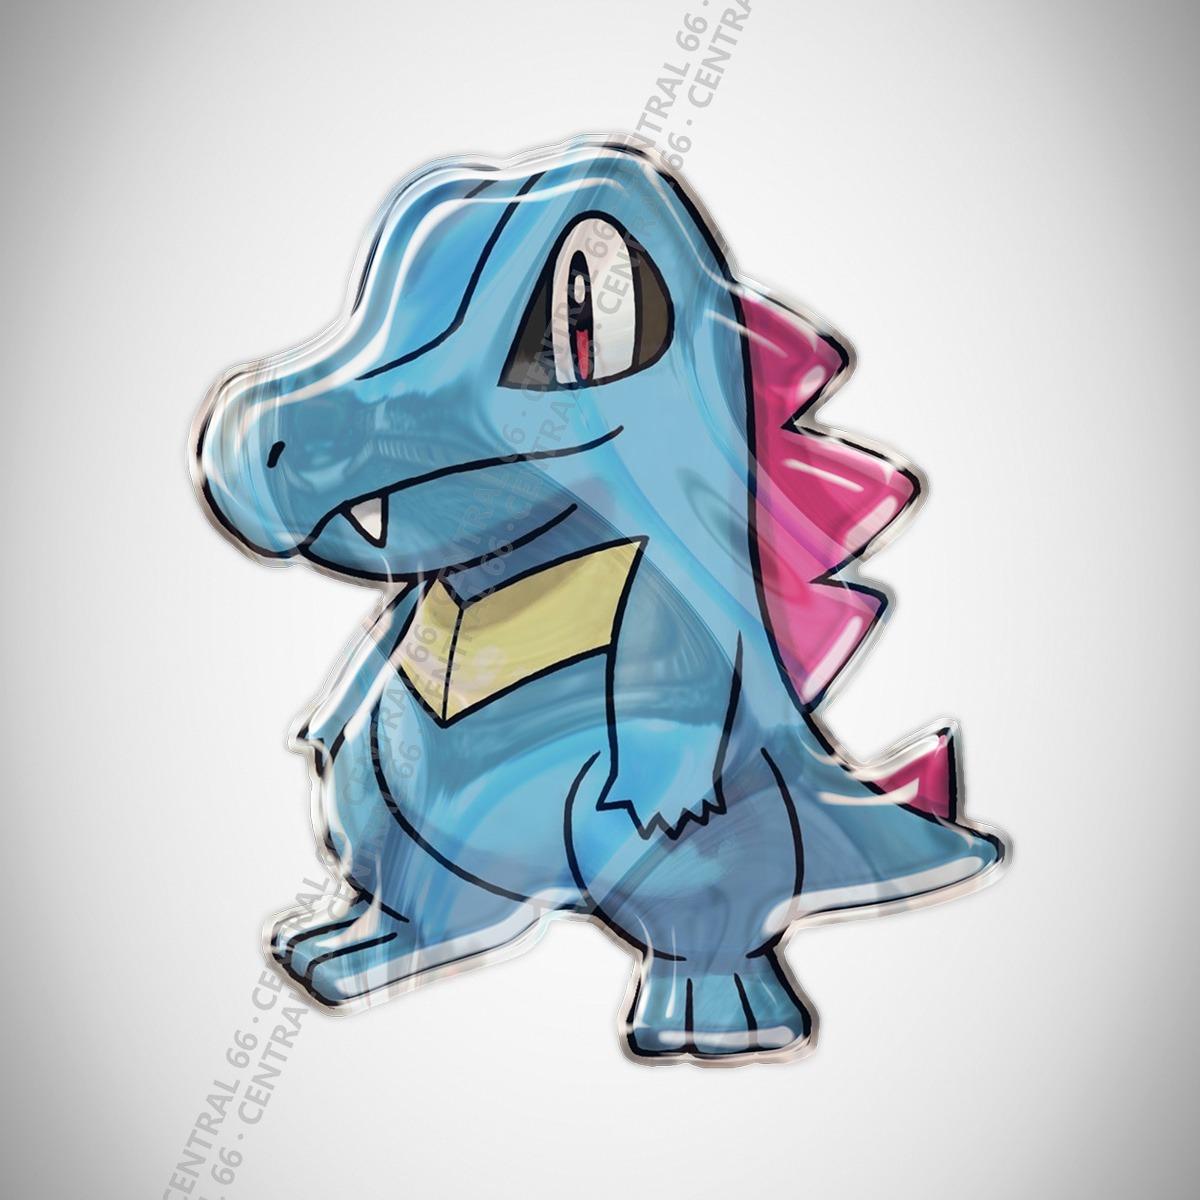 Adesivo Desenho Pokemon Totodile Resinado R 29 90 Em Mercado Livre